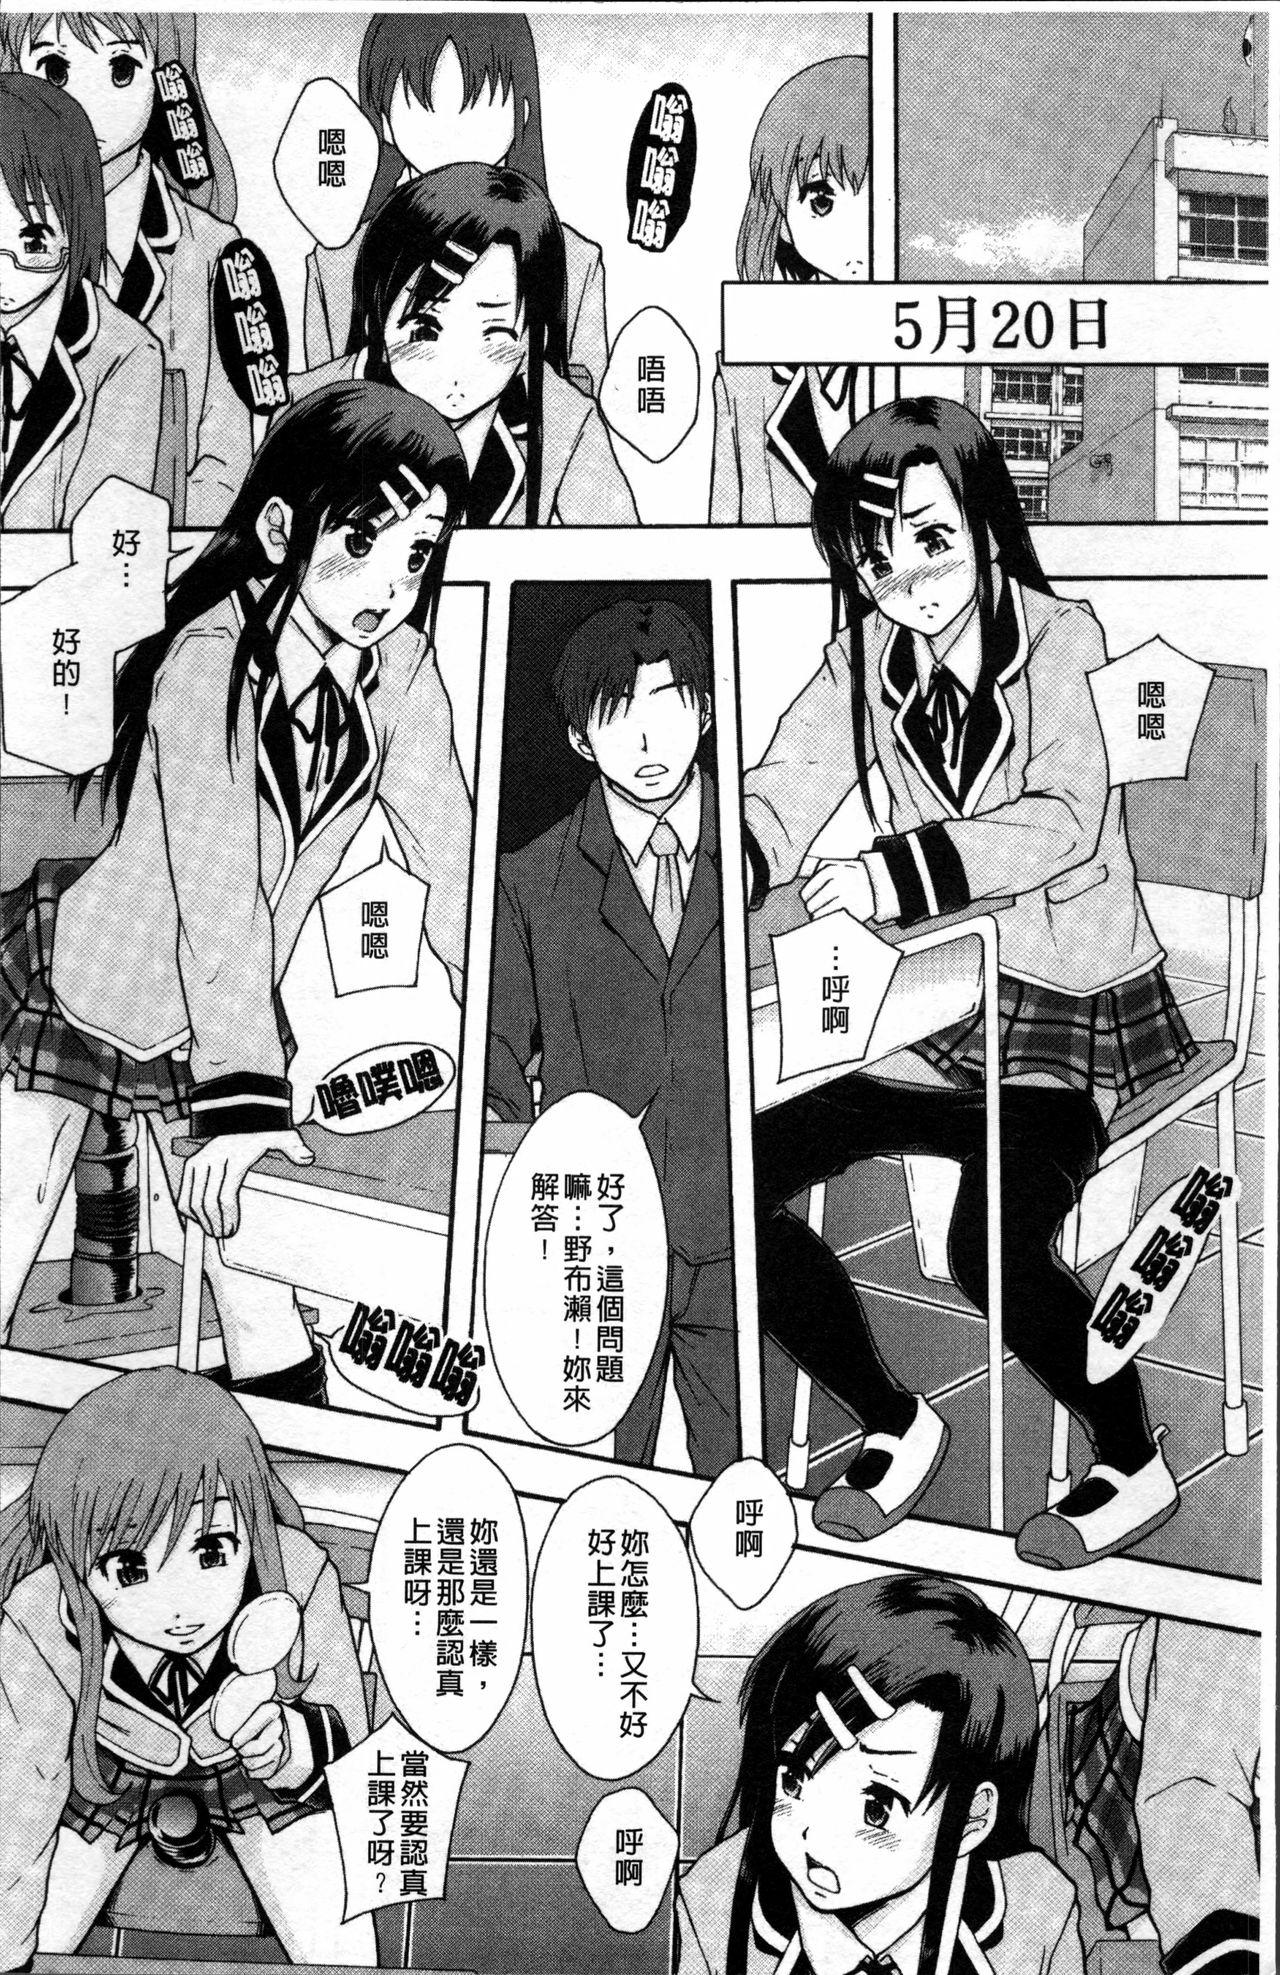 Anoko no Class wa AV-ka 32